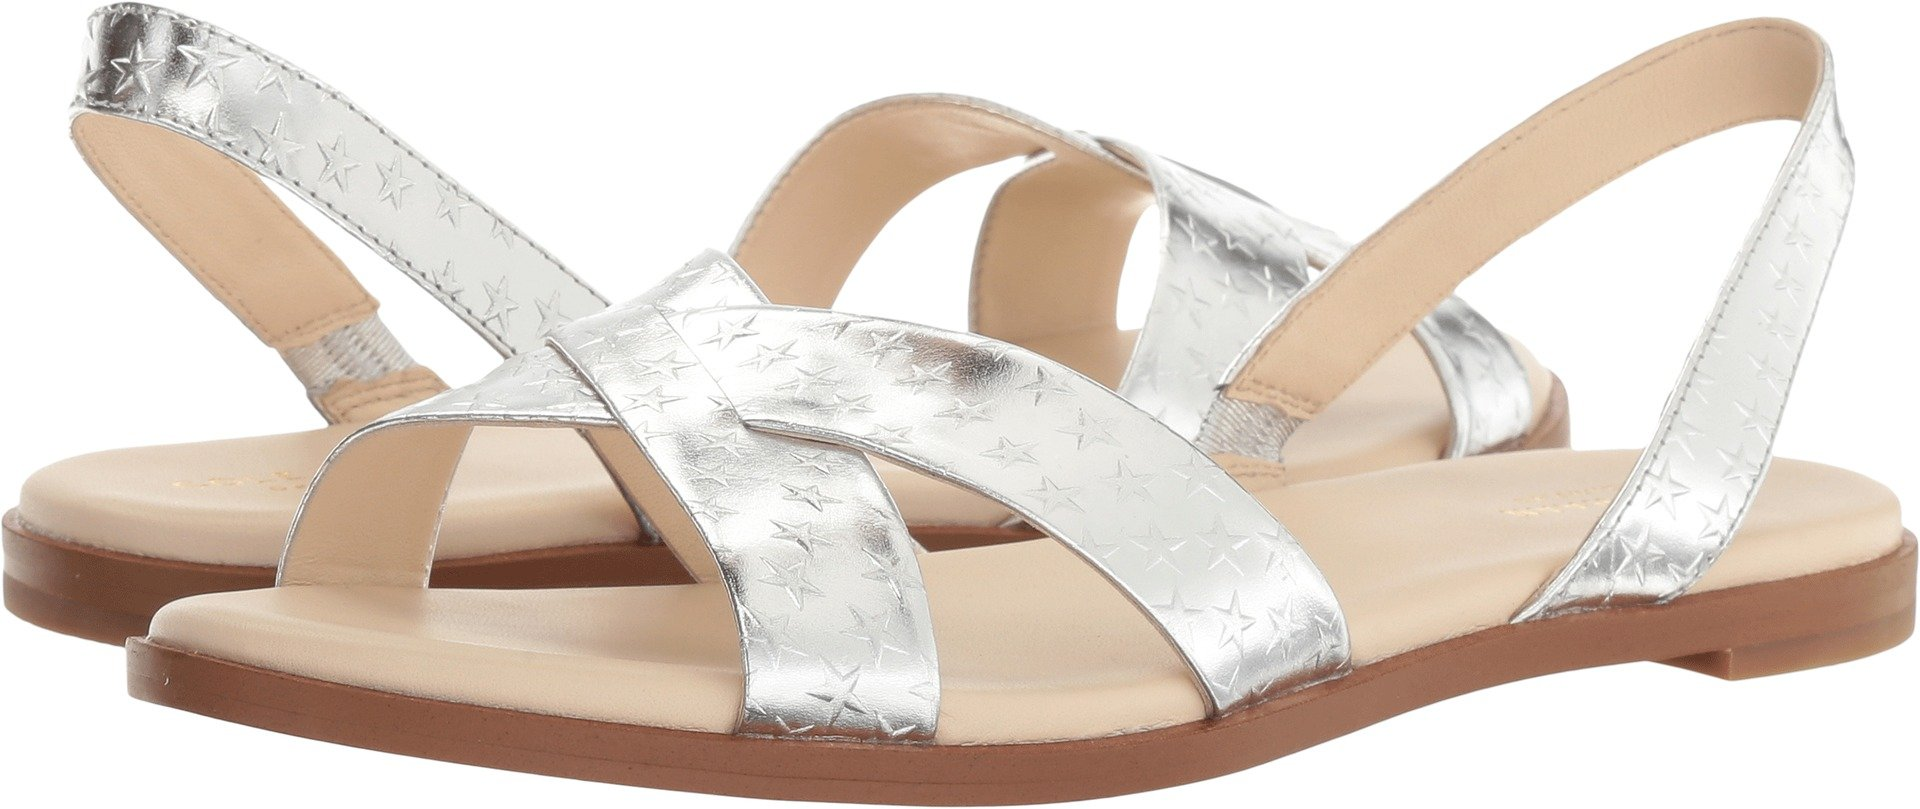 Cole Haan Women's Anica Sling Sandal, Silver/Metallic Star Print, 5 B US